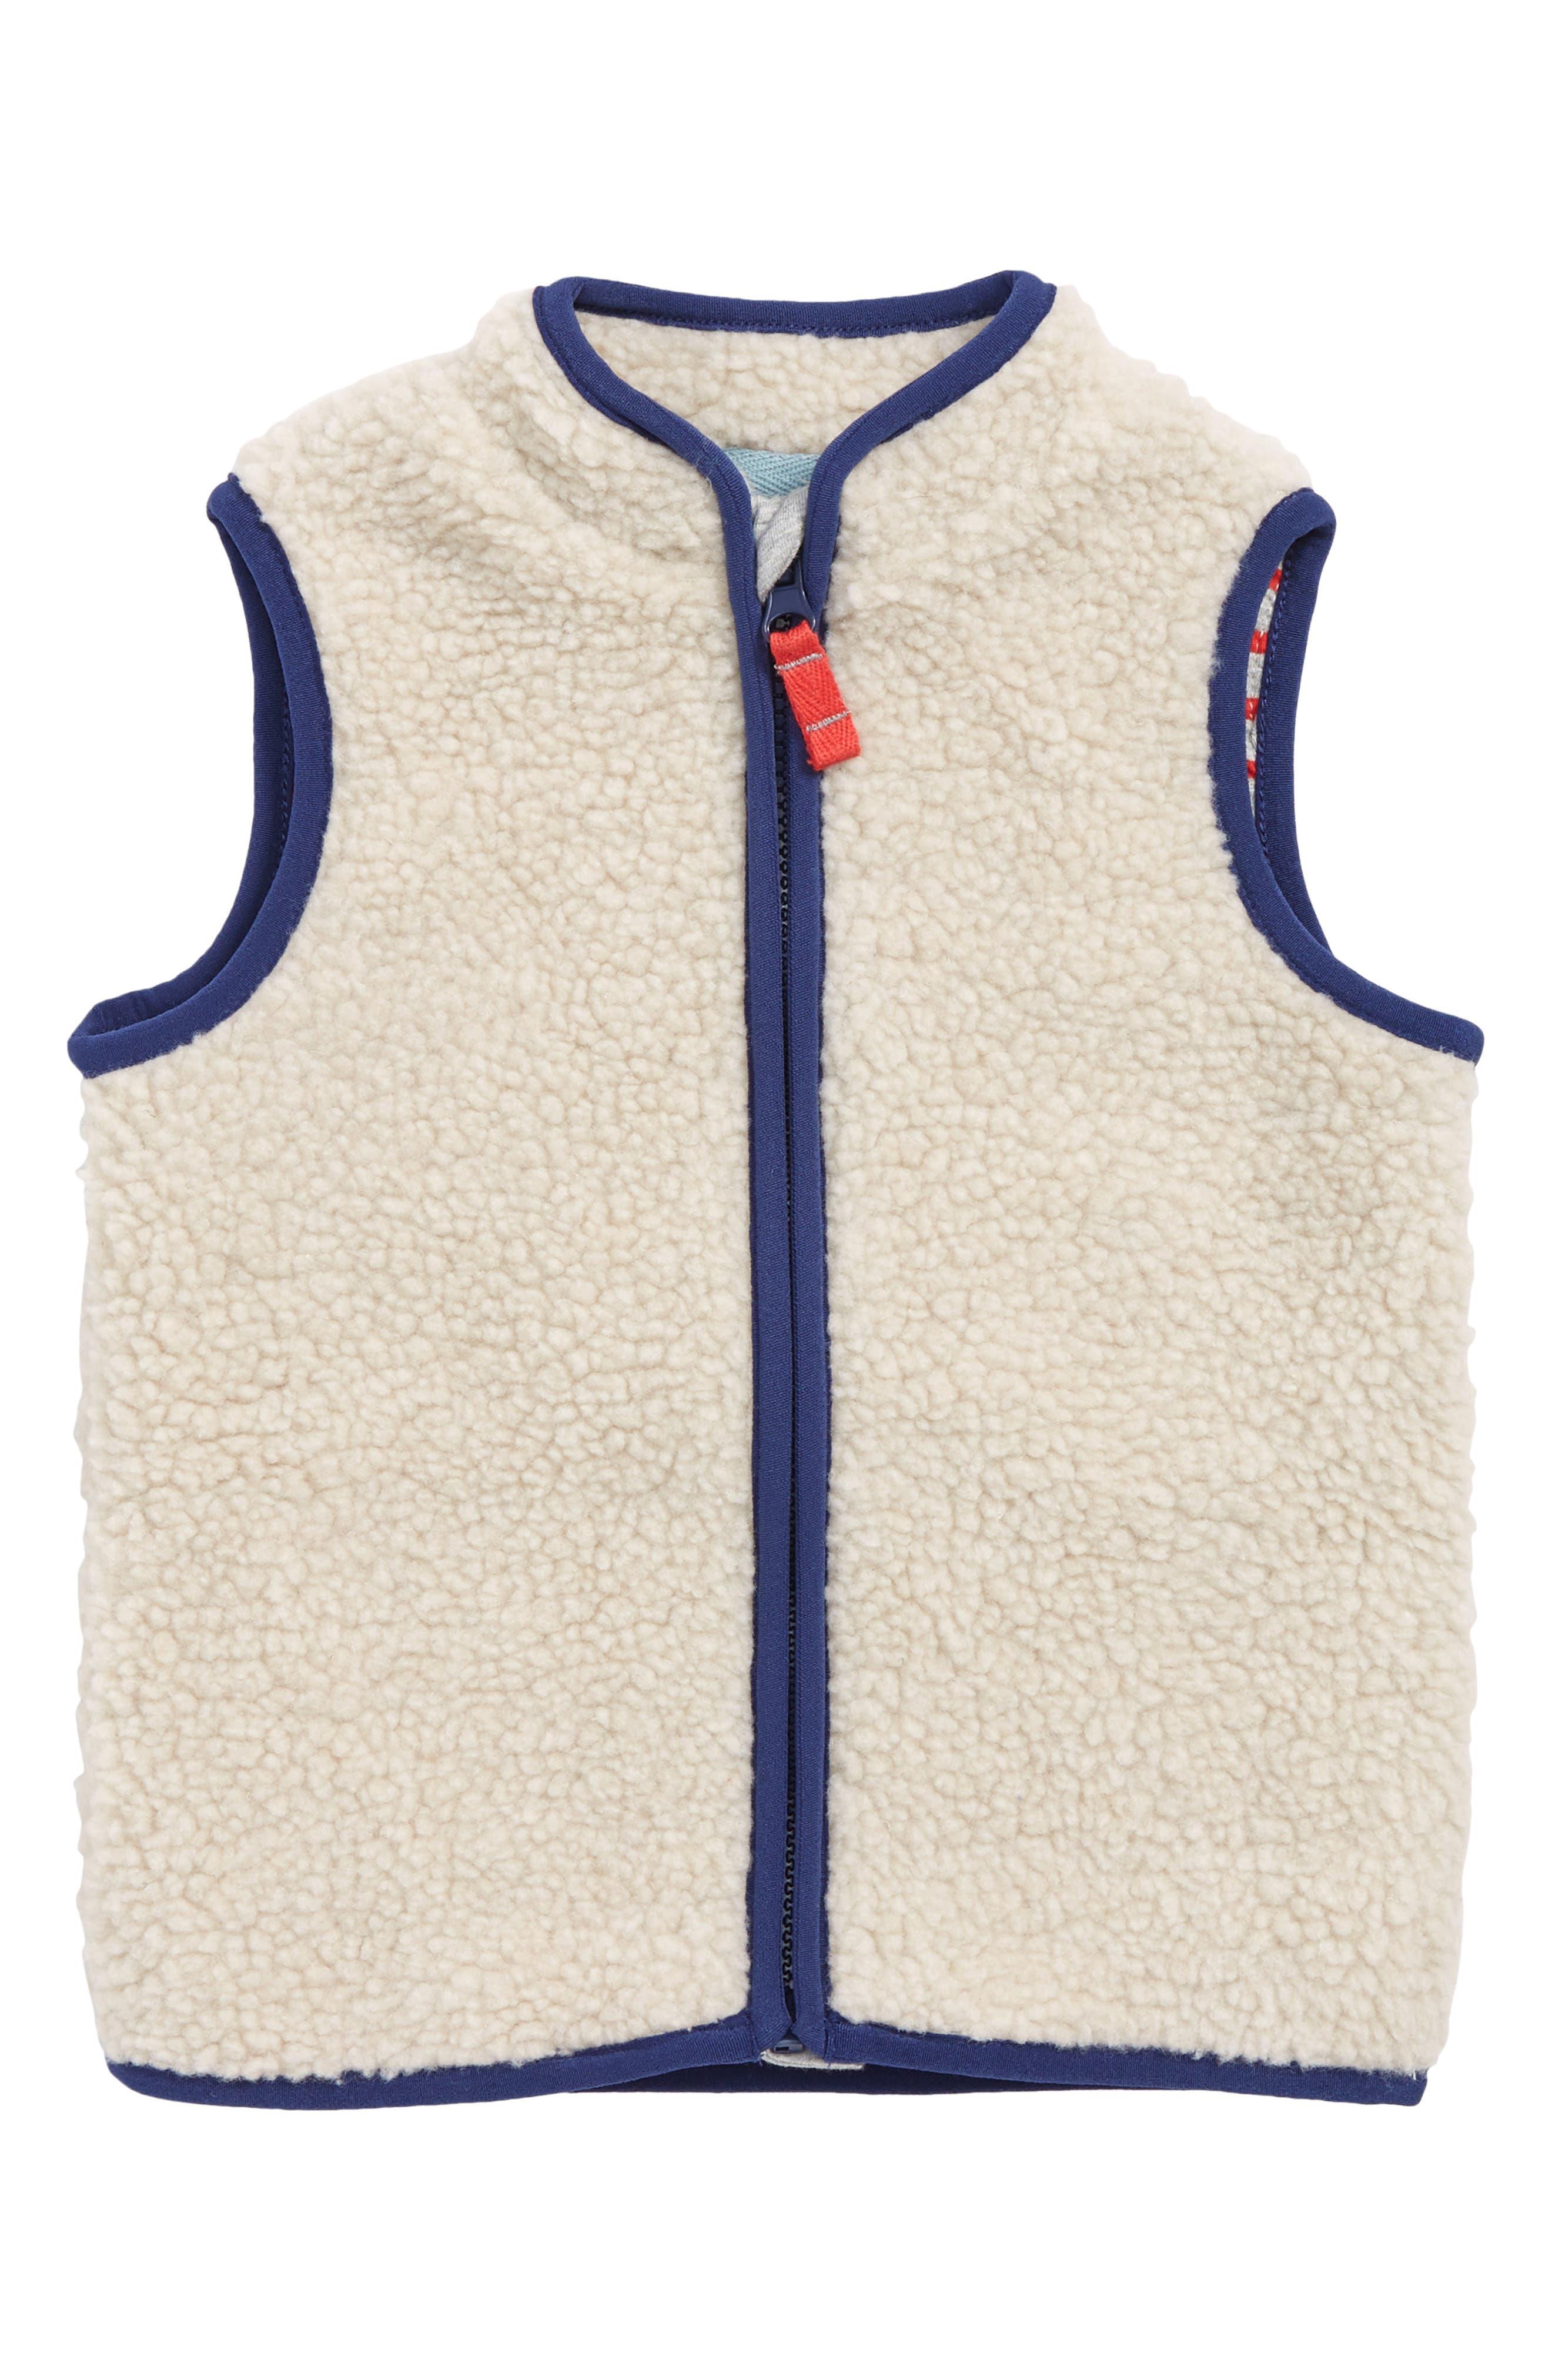 Cosy Borg Fleece Vest,                         Main,                         color, 251